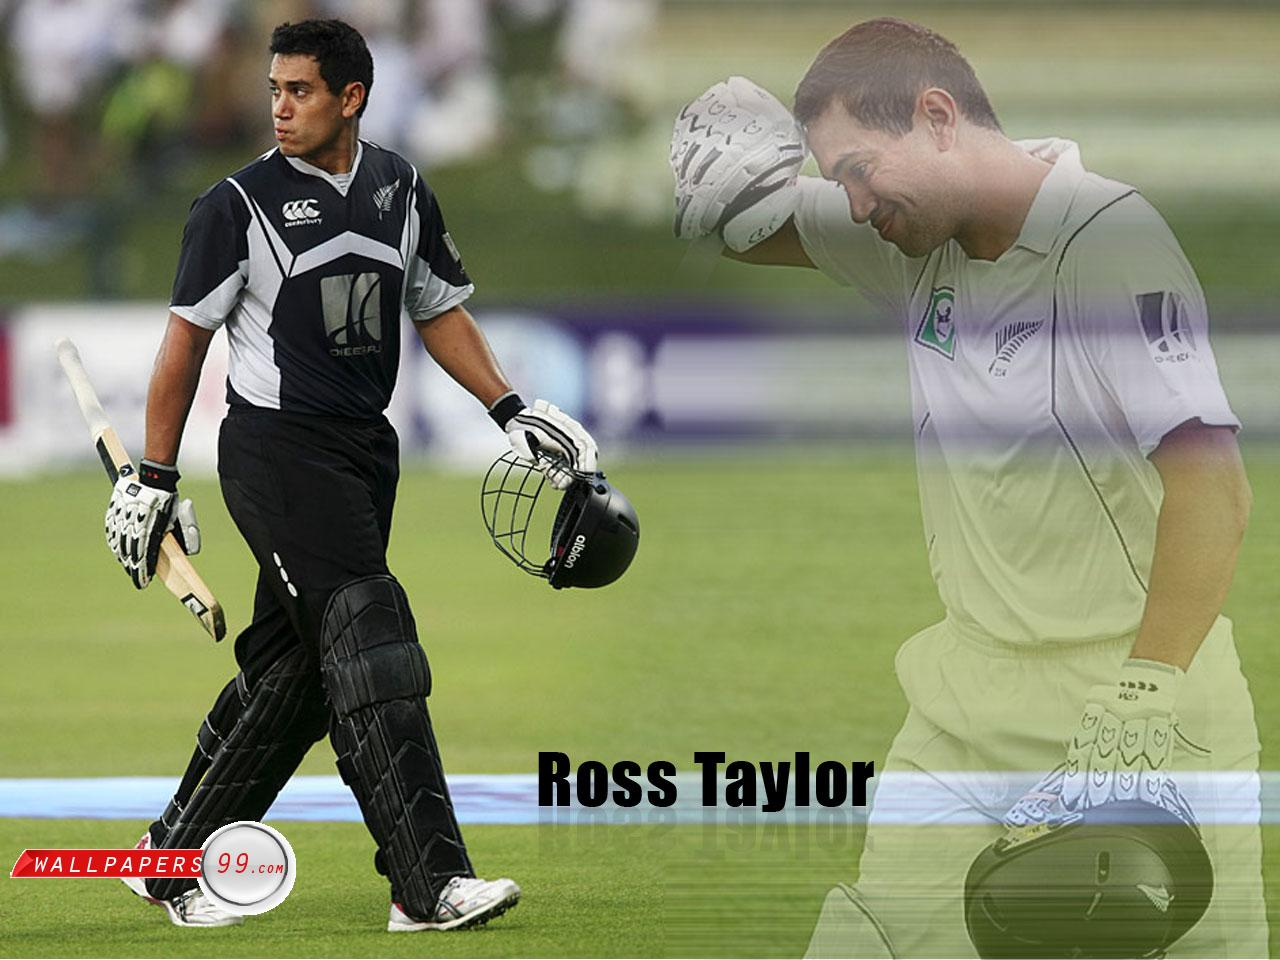 http://2.bp.blogspot.com/_1cFE0-abvYk/TUW82fQbQEI/AAAAAAAAAJo/b8cim6TgCi4/s1600/Ross_Taylor_31311.jpg